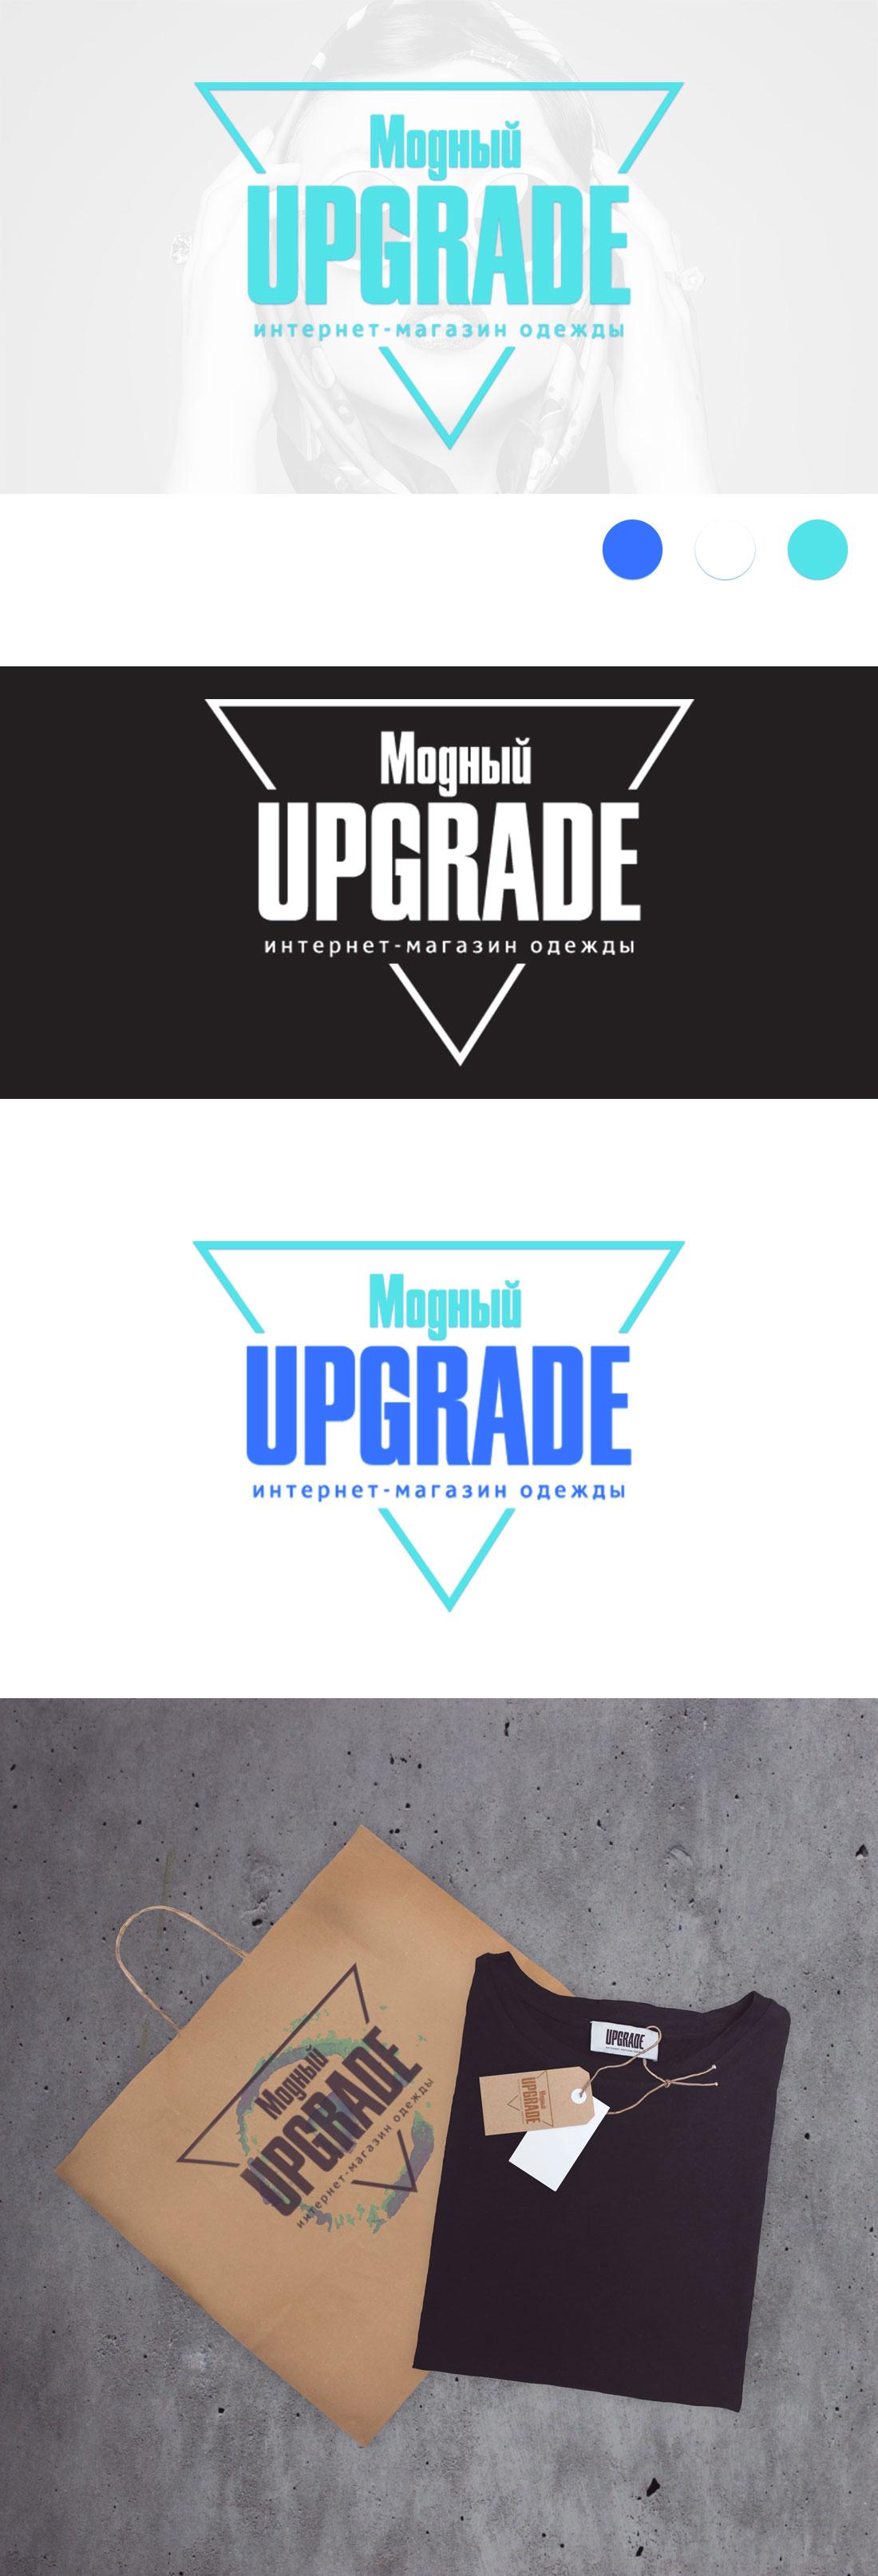 "Логотип интернет магазина ""Модный UPGRADE"" фото f_0615947f6e69cc3e.jpg"